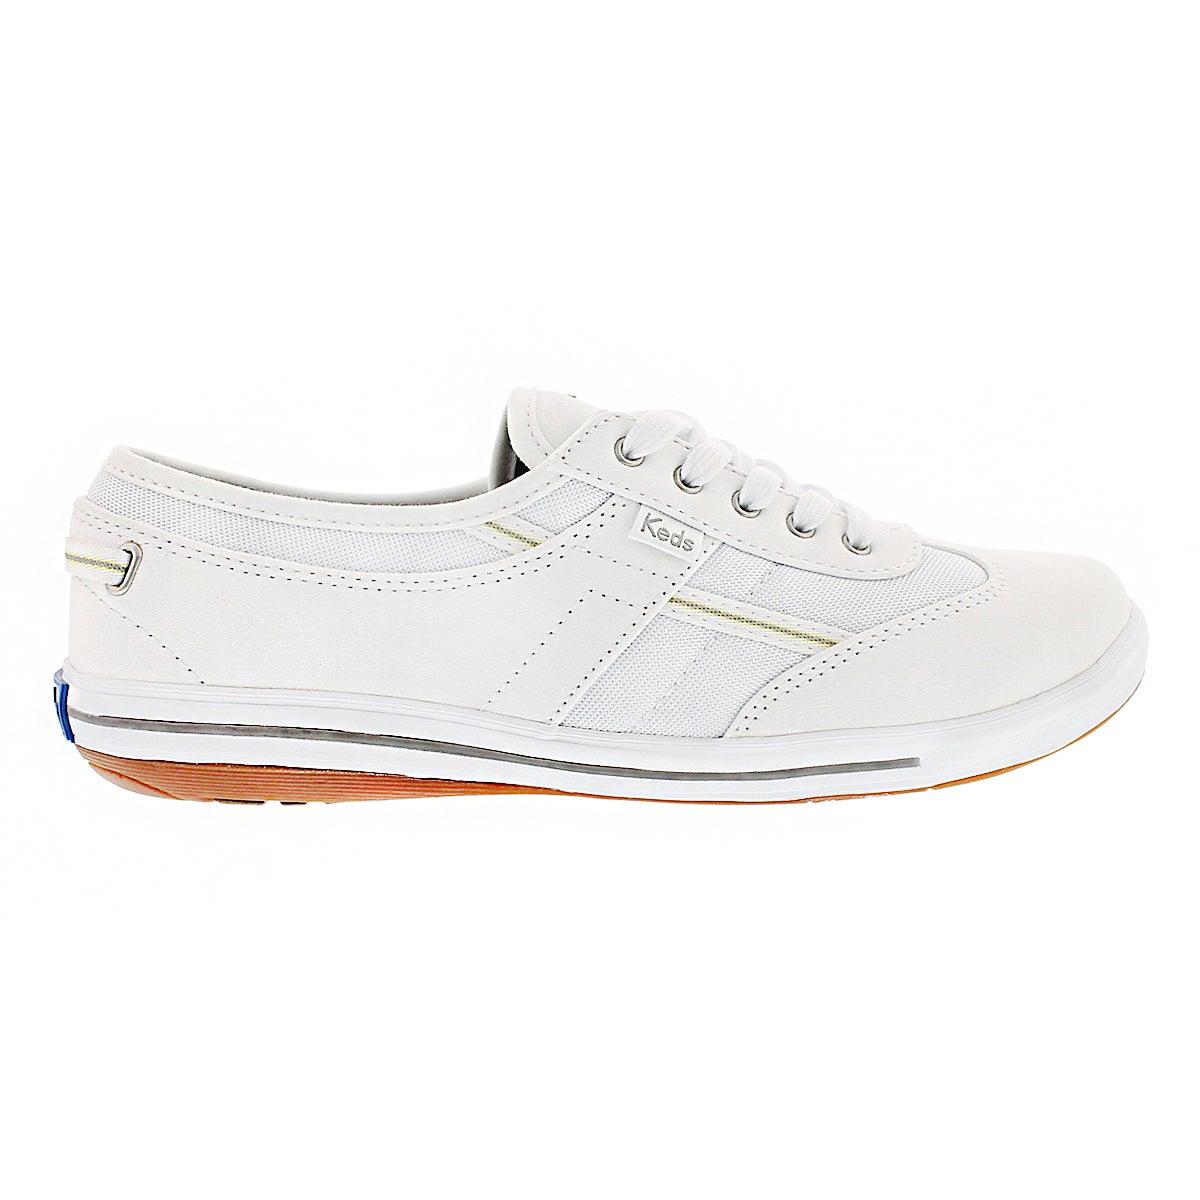 Lds Craze T-Toe white sneaker